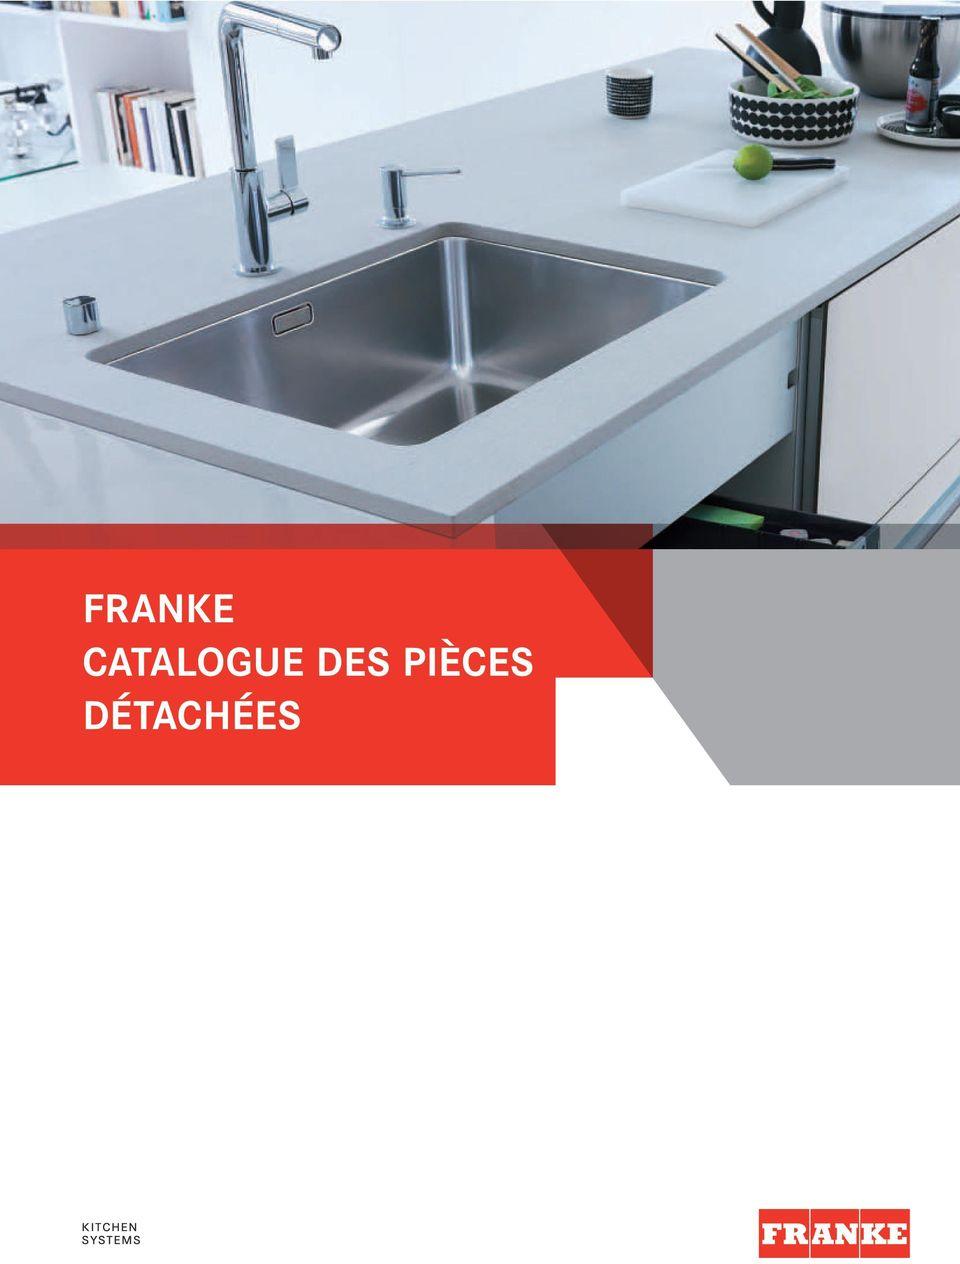 franke catalogue des pieces detachees